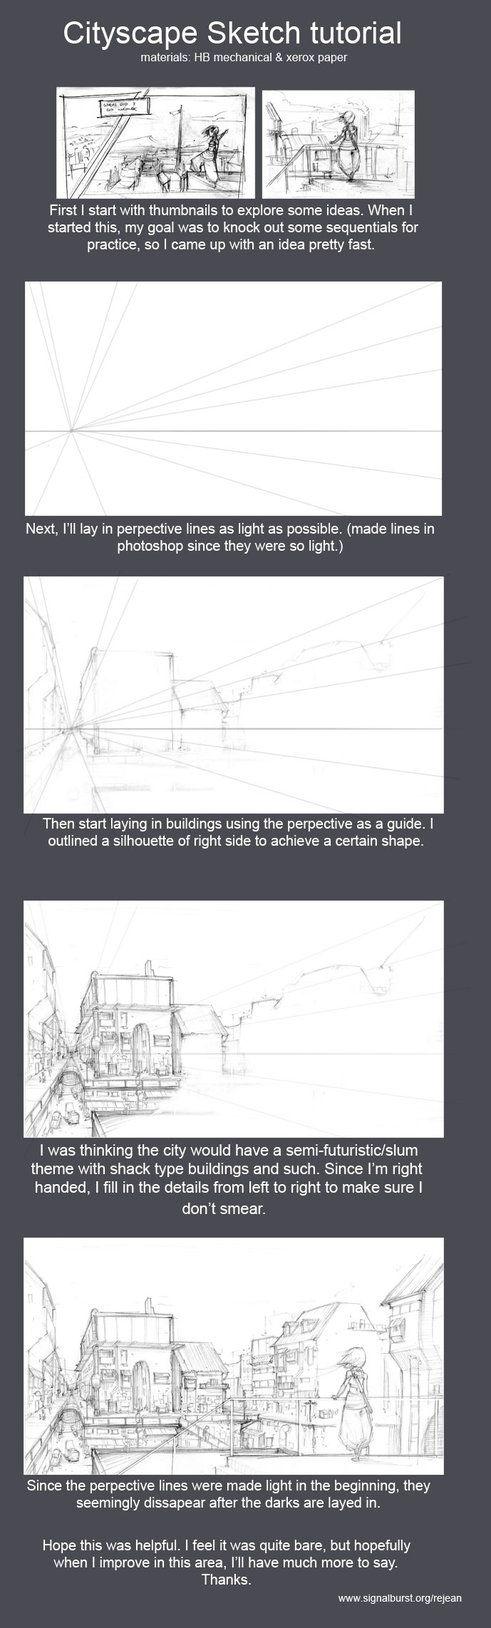 Cityscape Sketch tutorial by kasai on deviantART